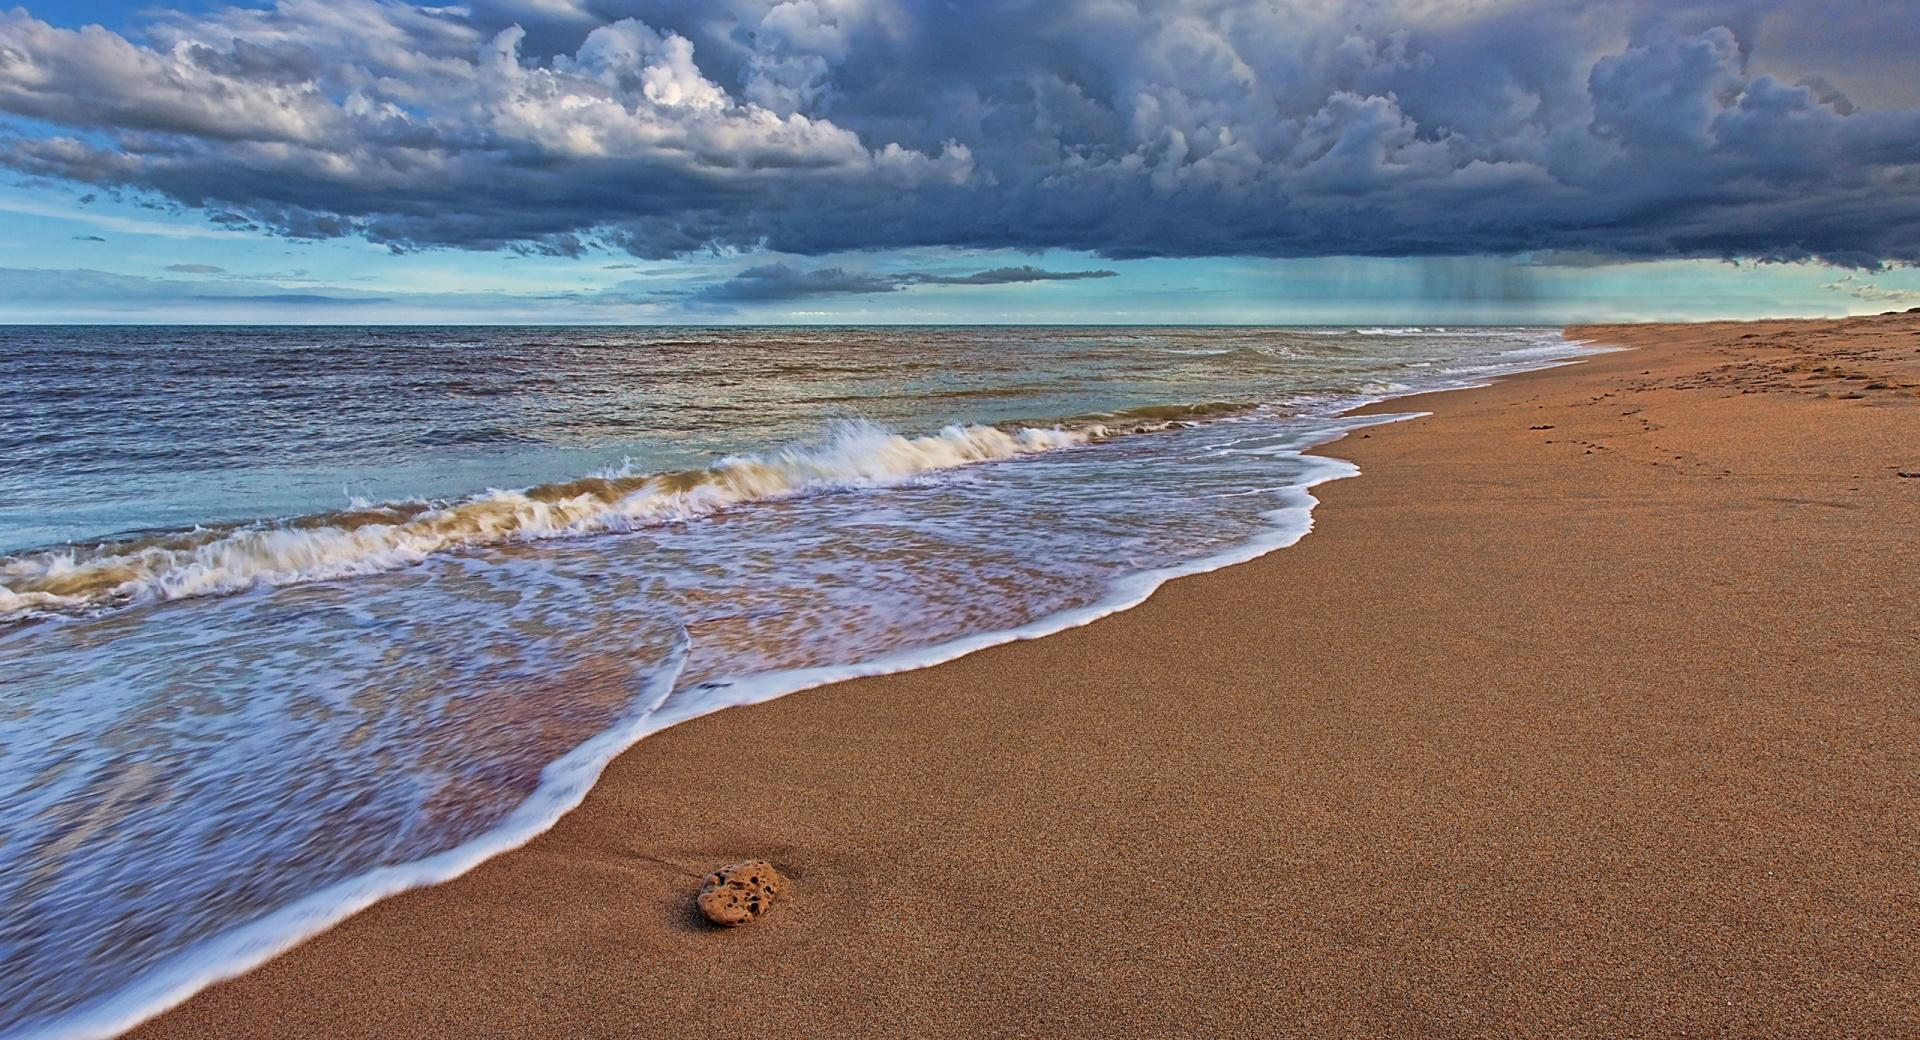 Beach Rain wallpapers HD quality